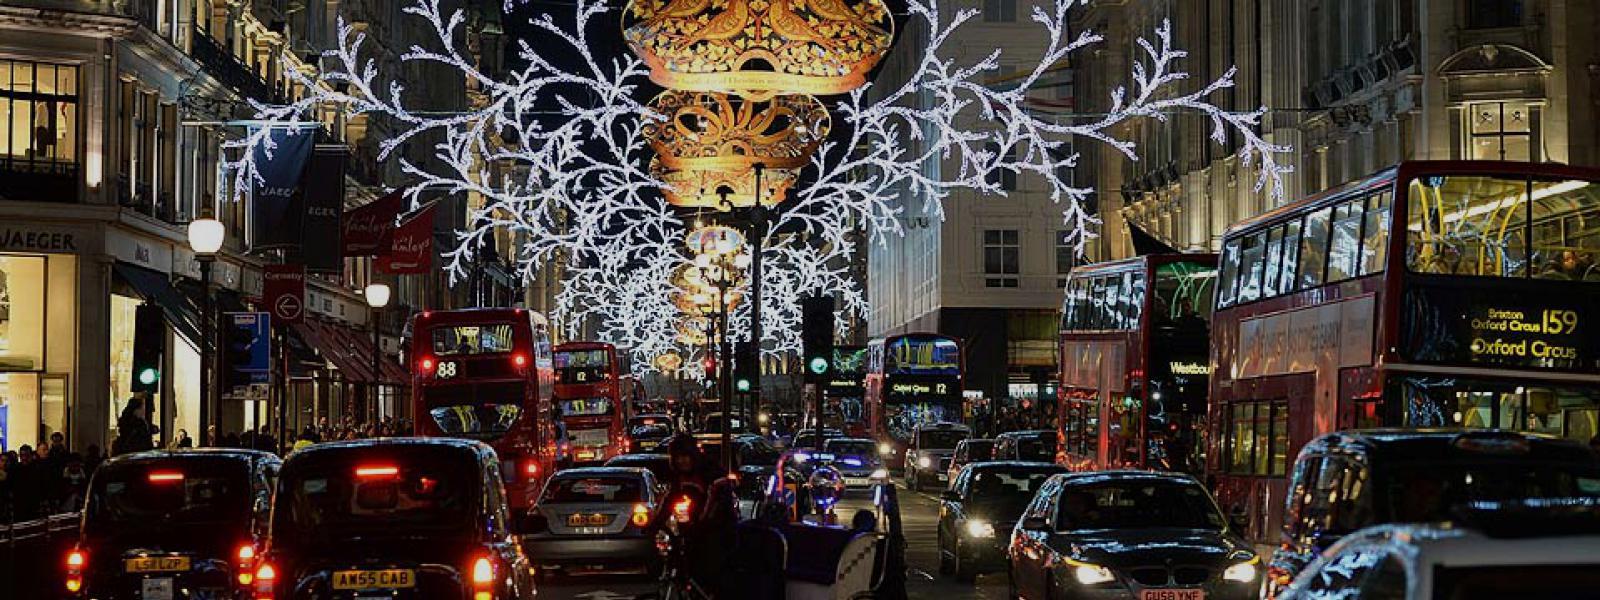 Oxford street kerstmarkt